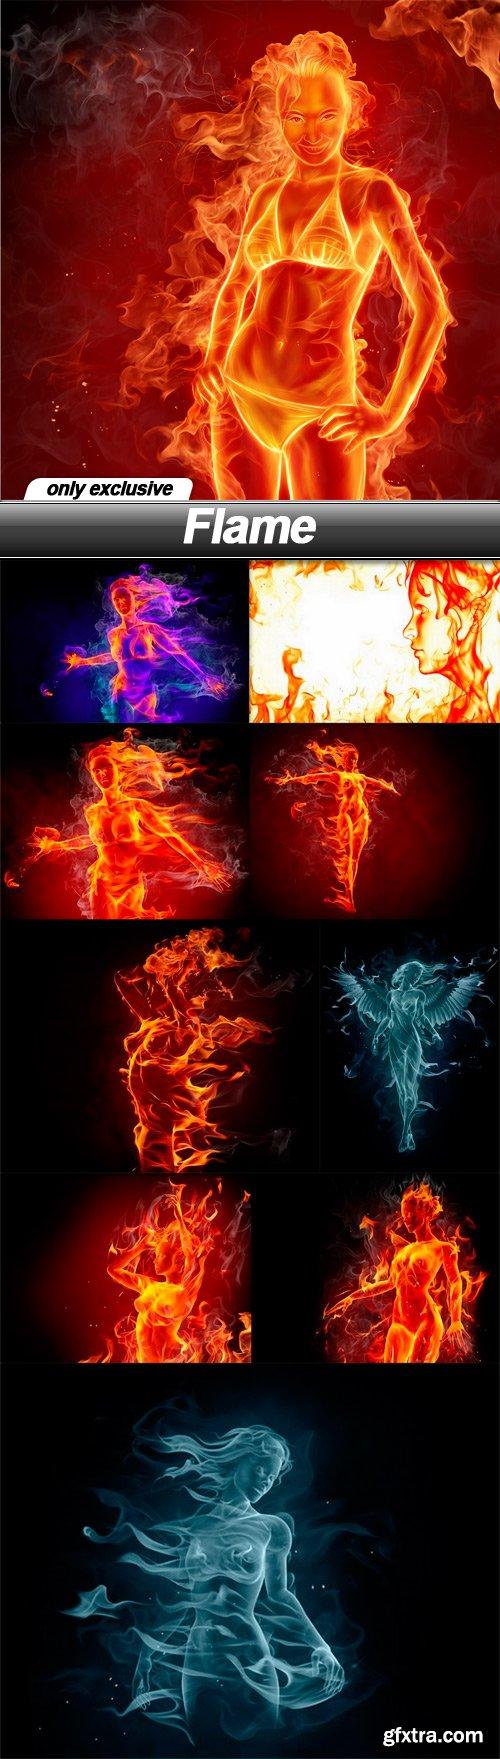 Flame - 10 UHQ JPEG